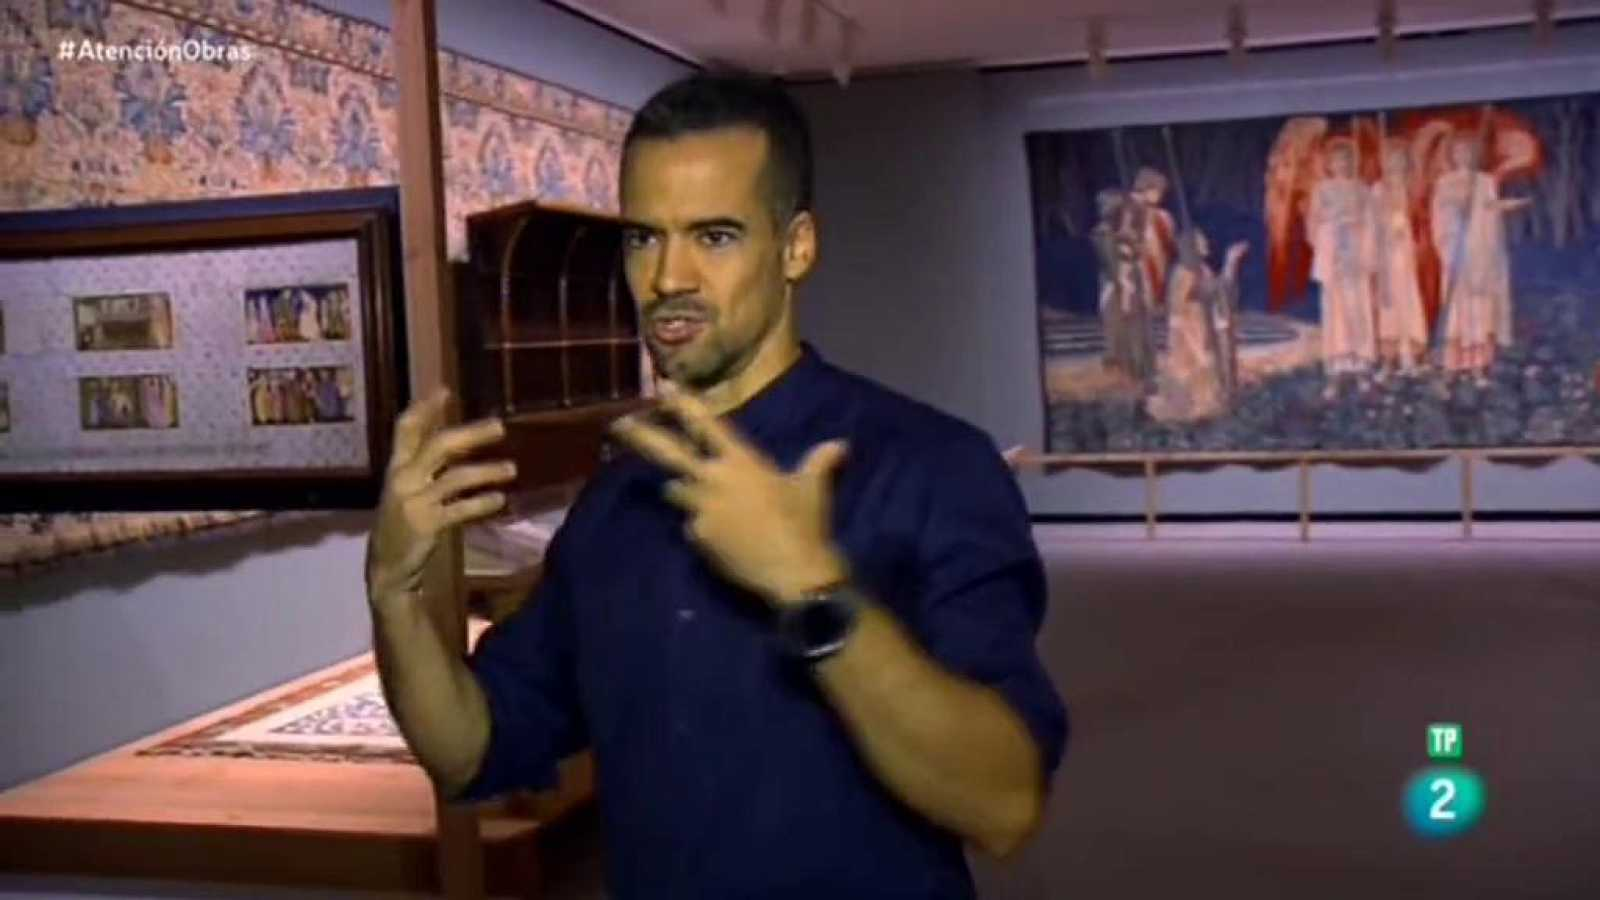 Atención obras - Diego Apesteguia nos acerca al arte de William Morris